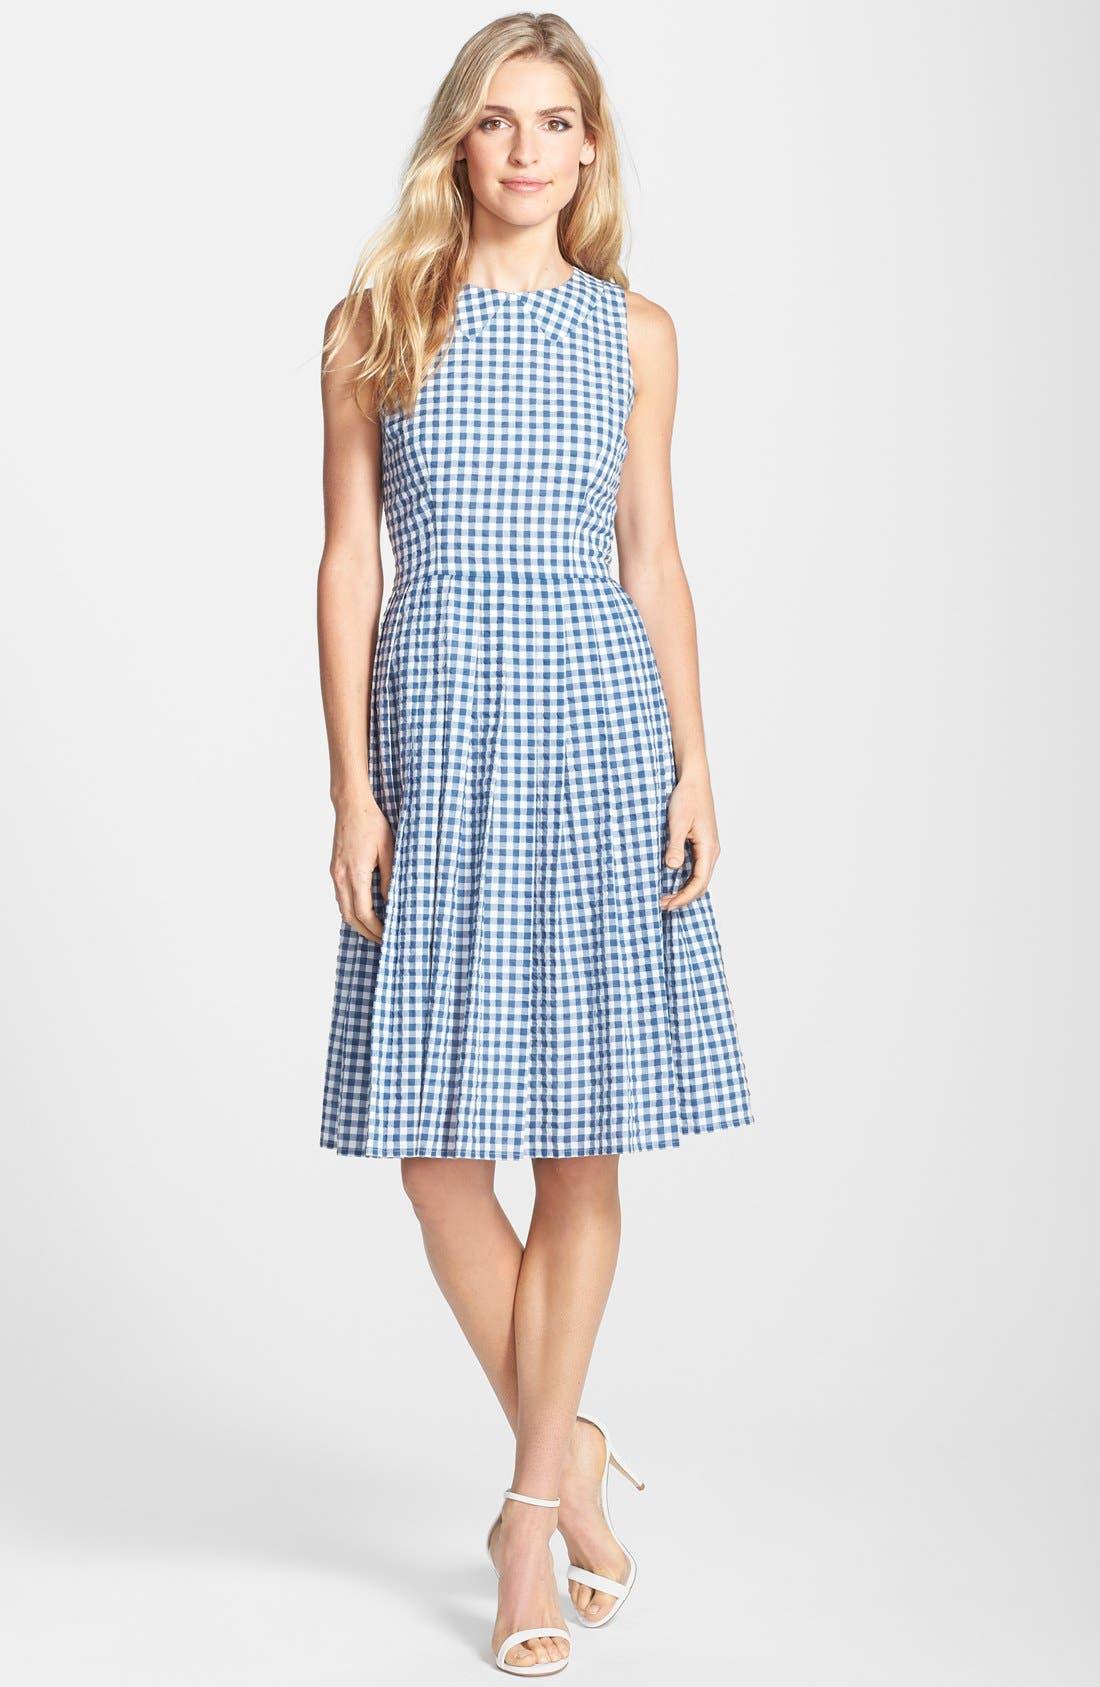 Alternate Image 1 Selected - Kaya & Sloane Gingham Cotton Fit & Flare Midi Dress